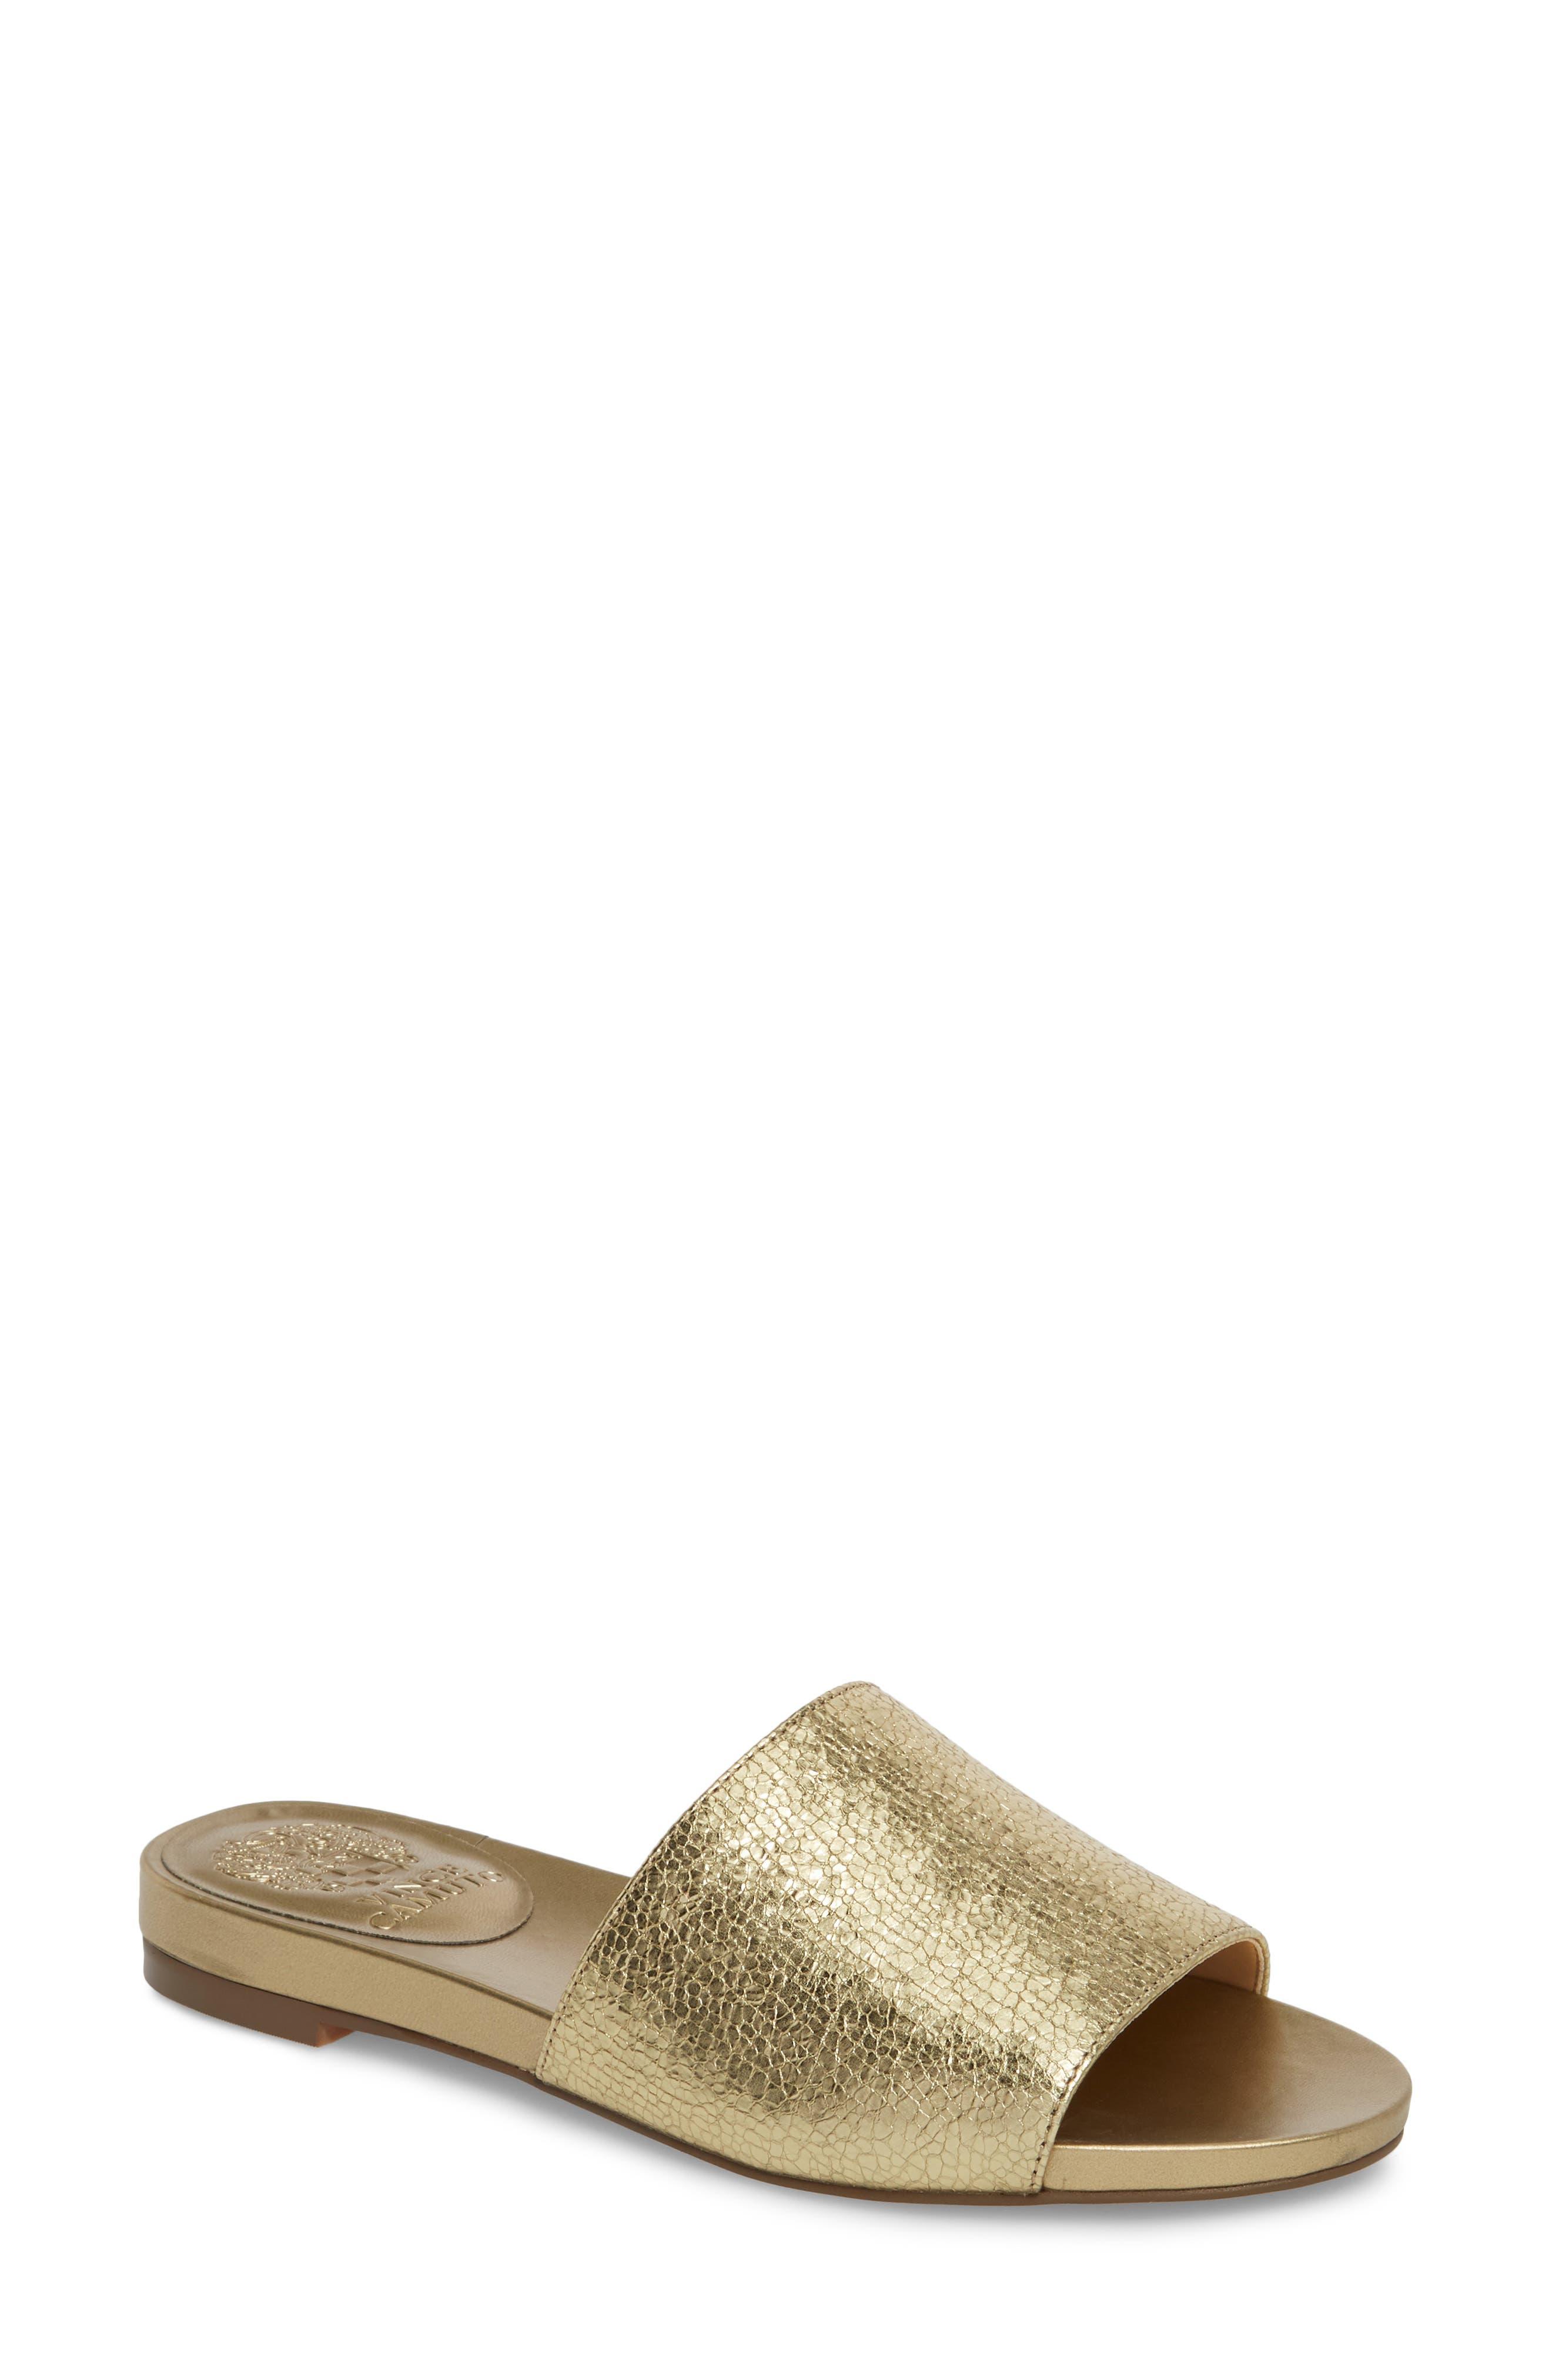 Haydan Slide Sandal,                         Main,                         color, Karat Gold Fabric